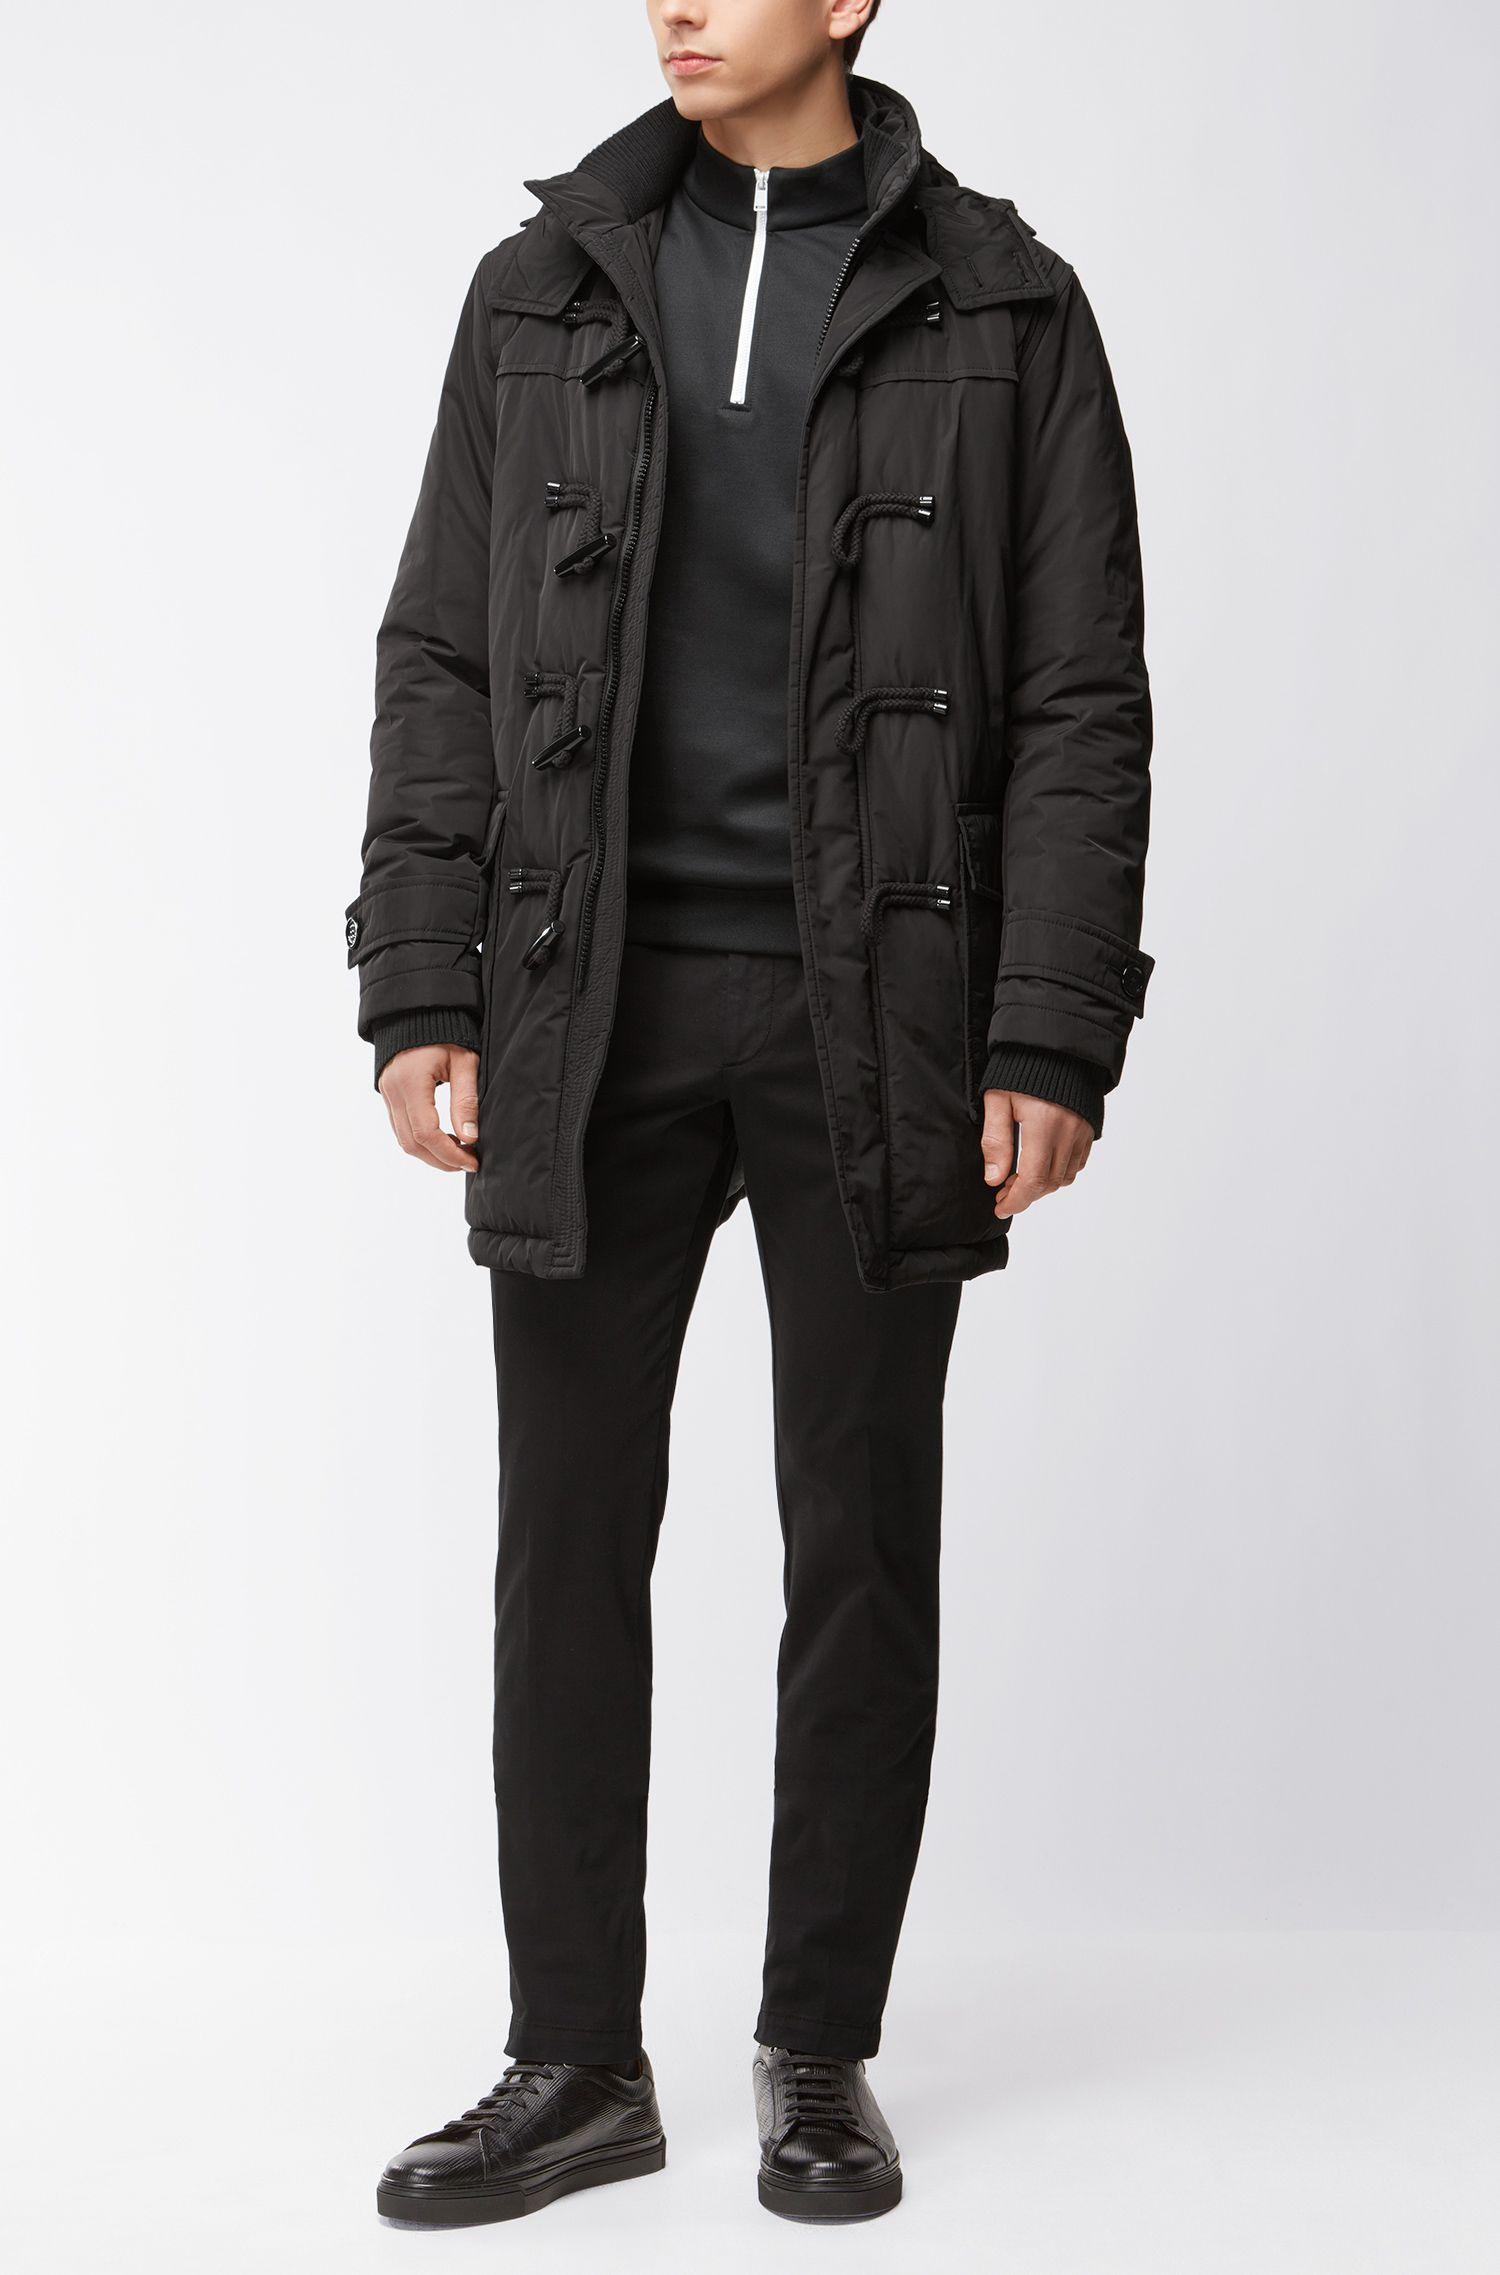 Jersey Half-Zip Sweater | Siegal, Black